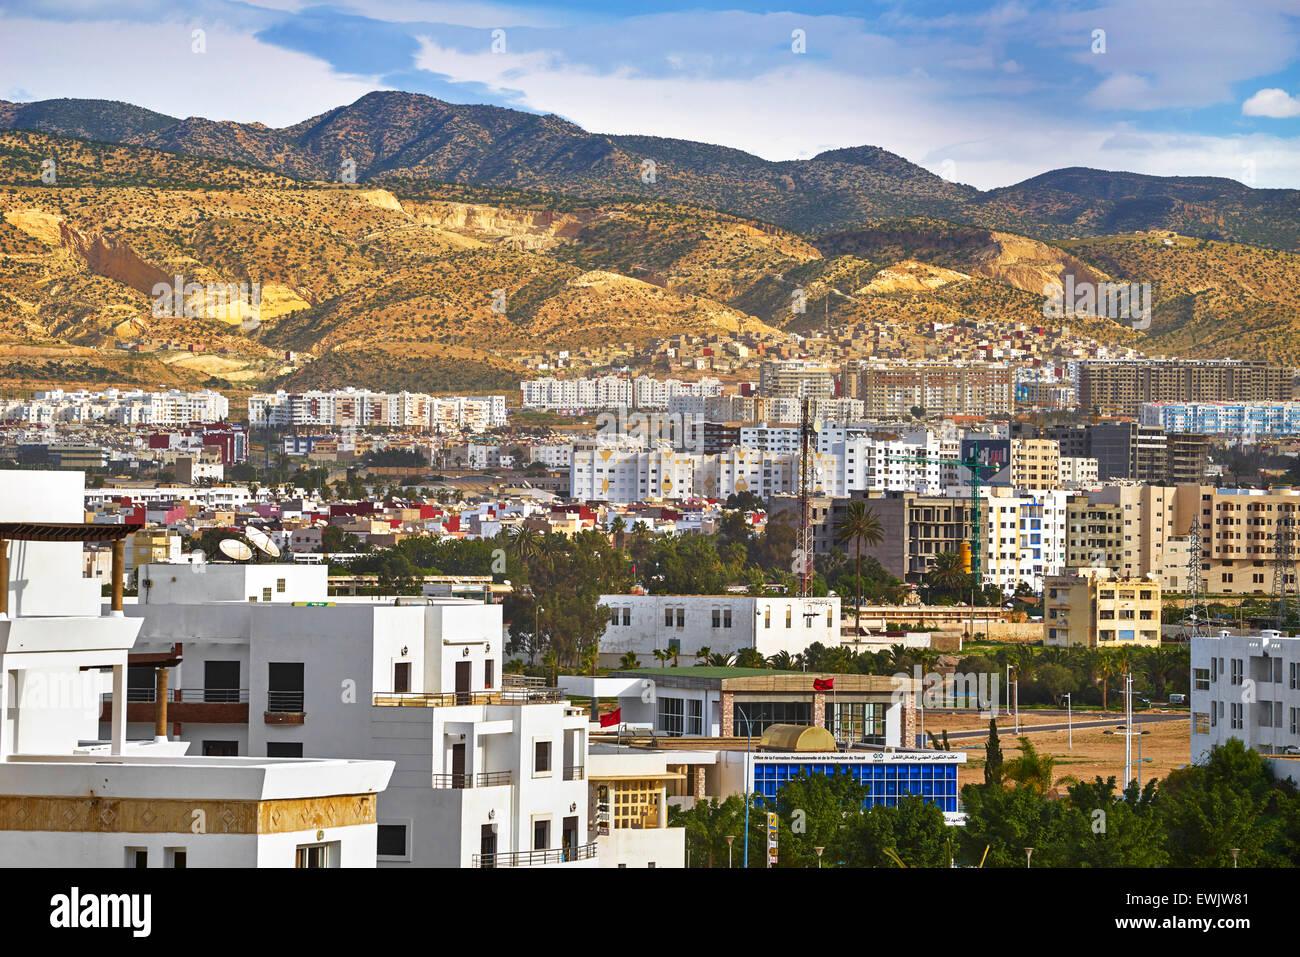 Agadir, Morocco, North Africa - Stock Image